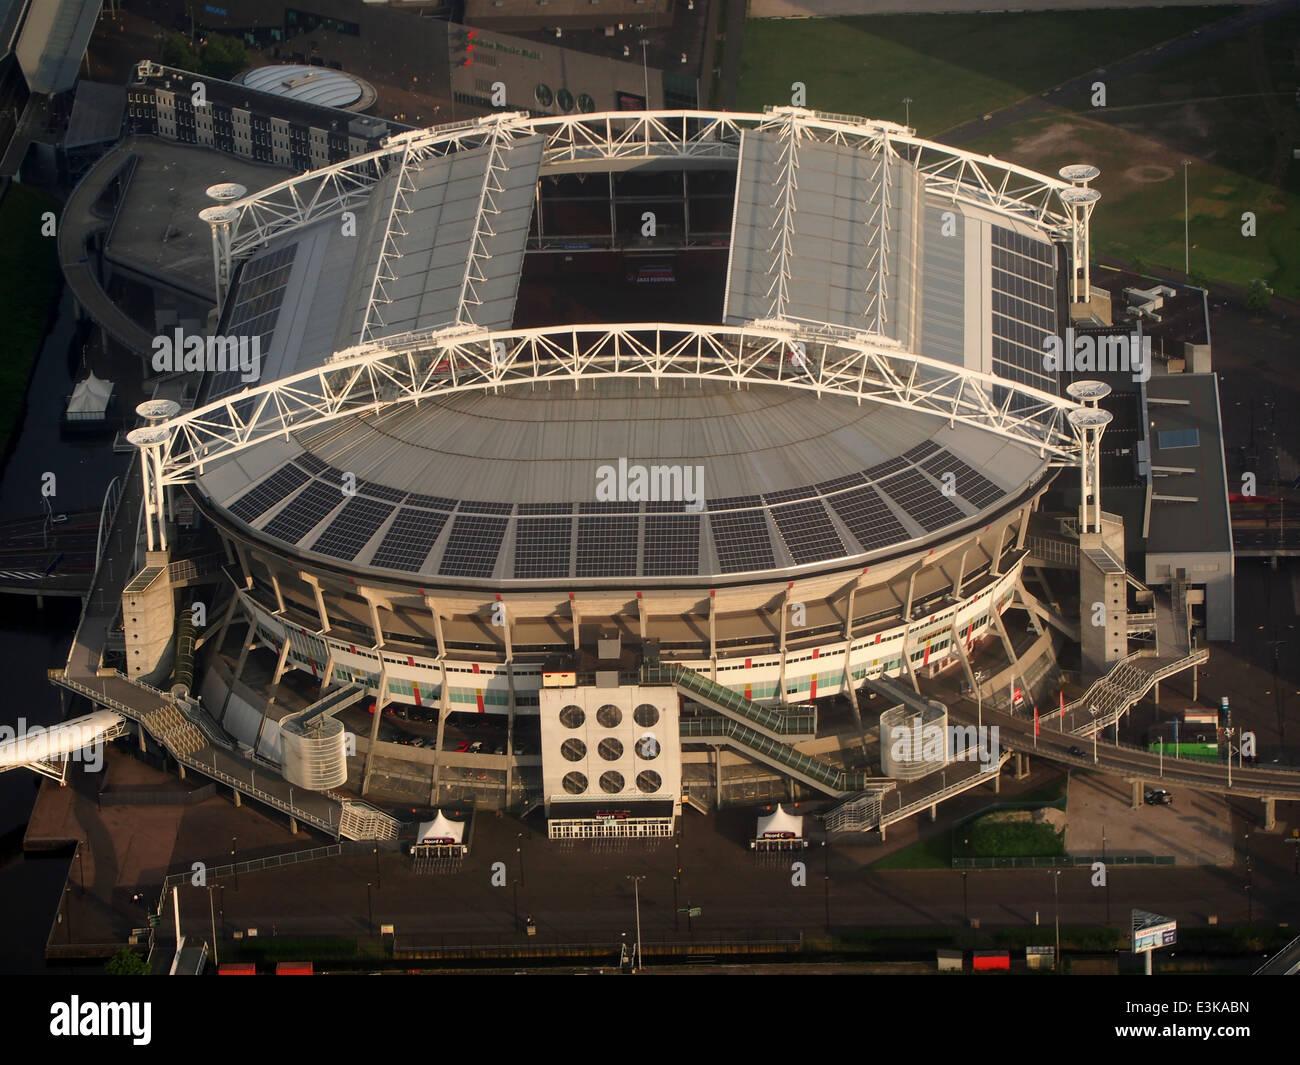 Arena, Ajax stadion, Amsterdam - Stock Image